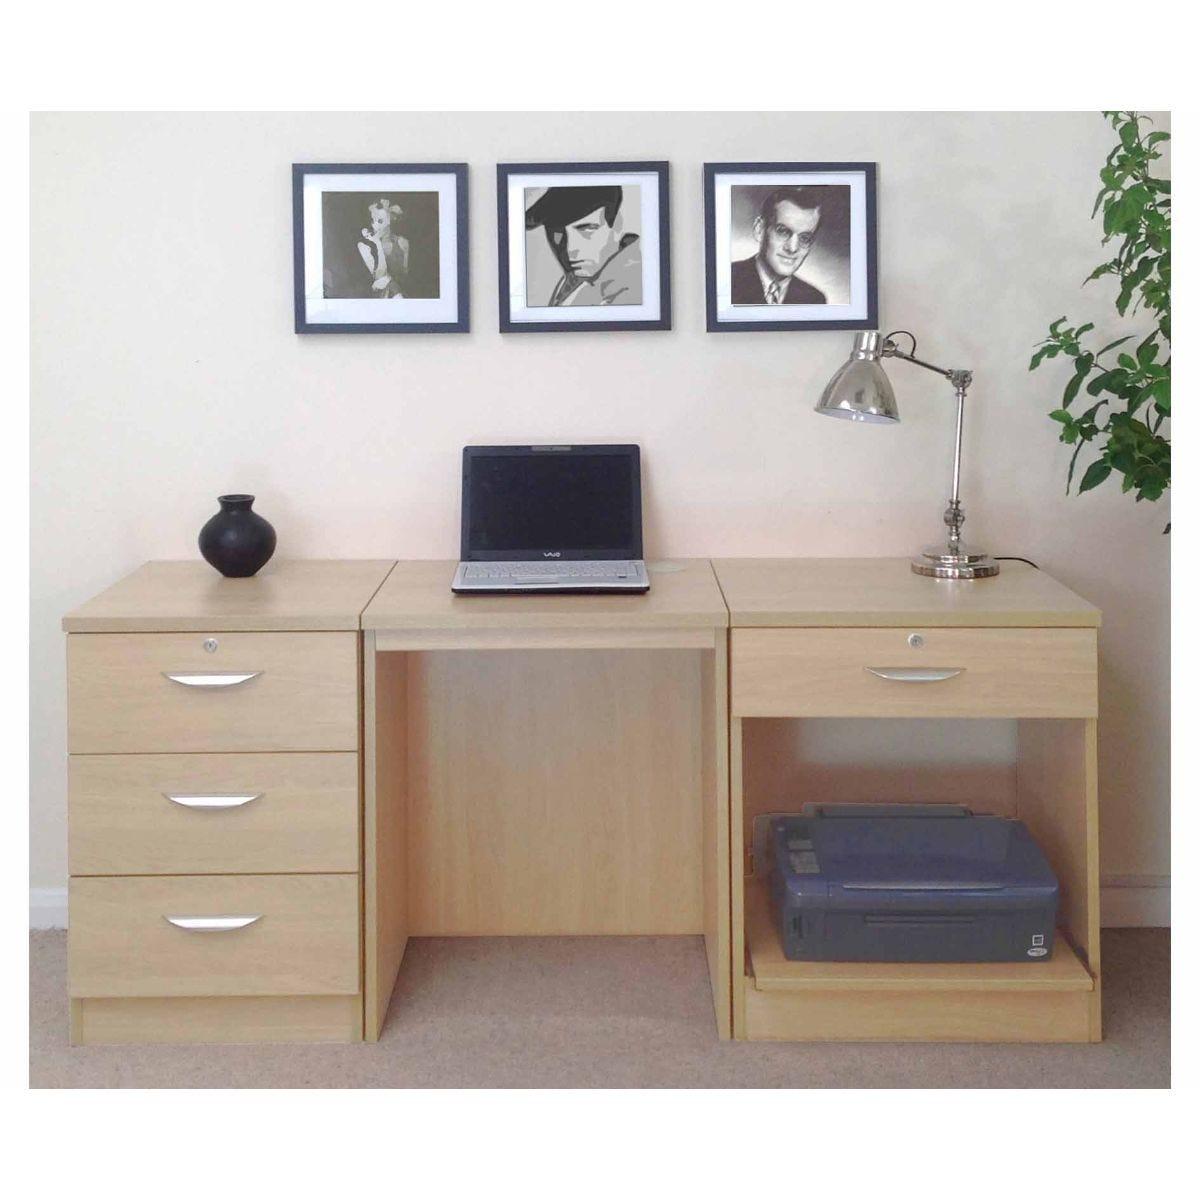 R White Home Office Furniture Desk Set, Beech Wood Grain